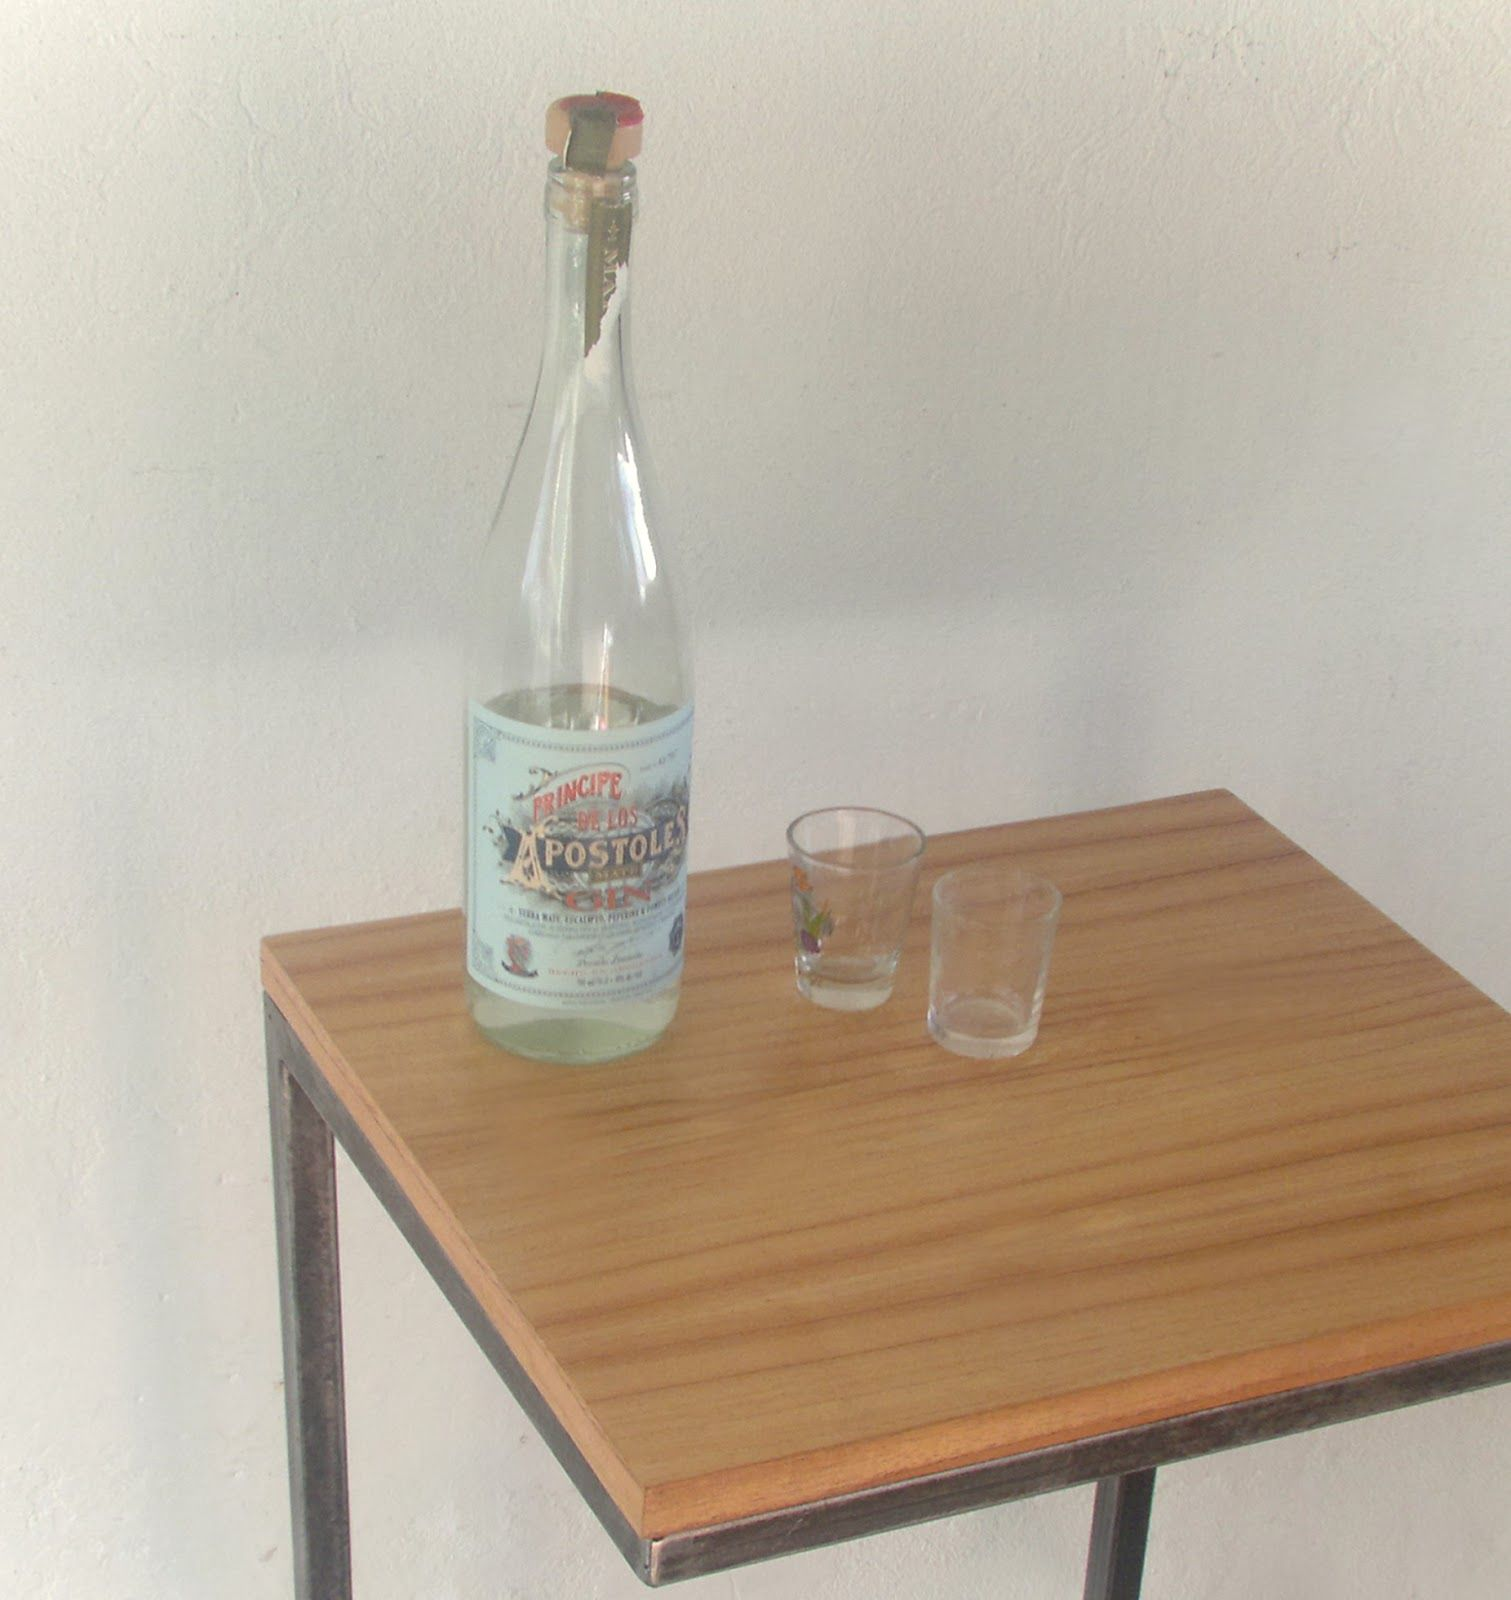 Trifecta muebles: Mesa de arrime hierro y madera. Auxiliar | Natalia ...